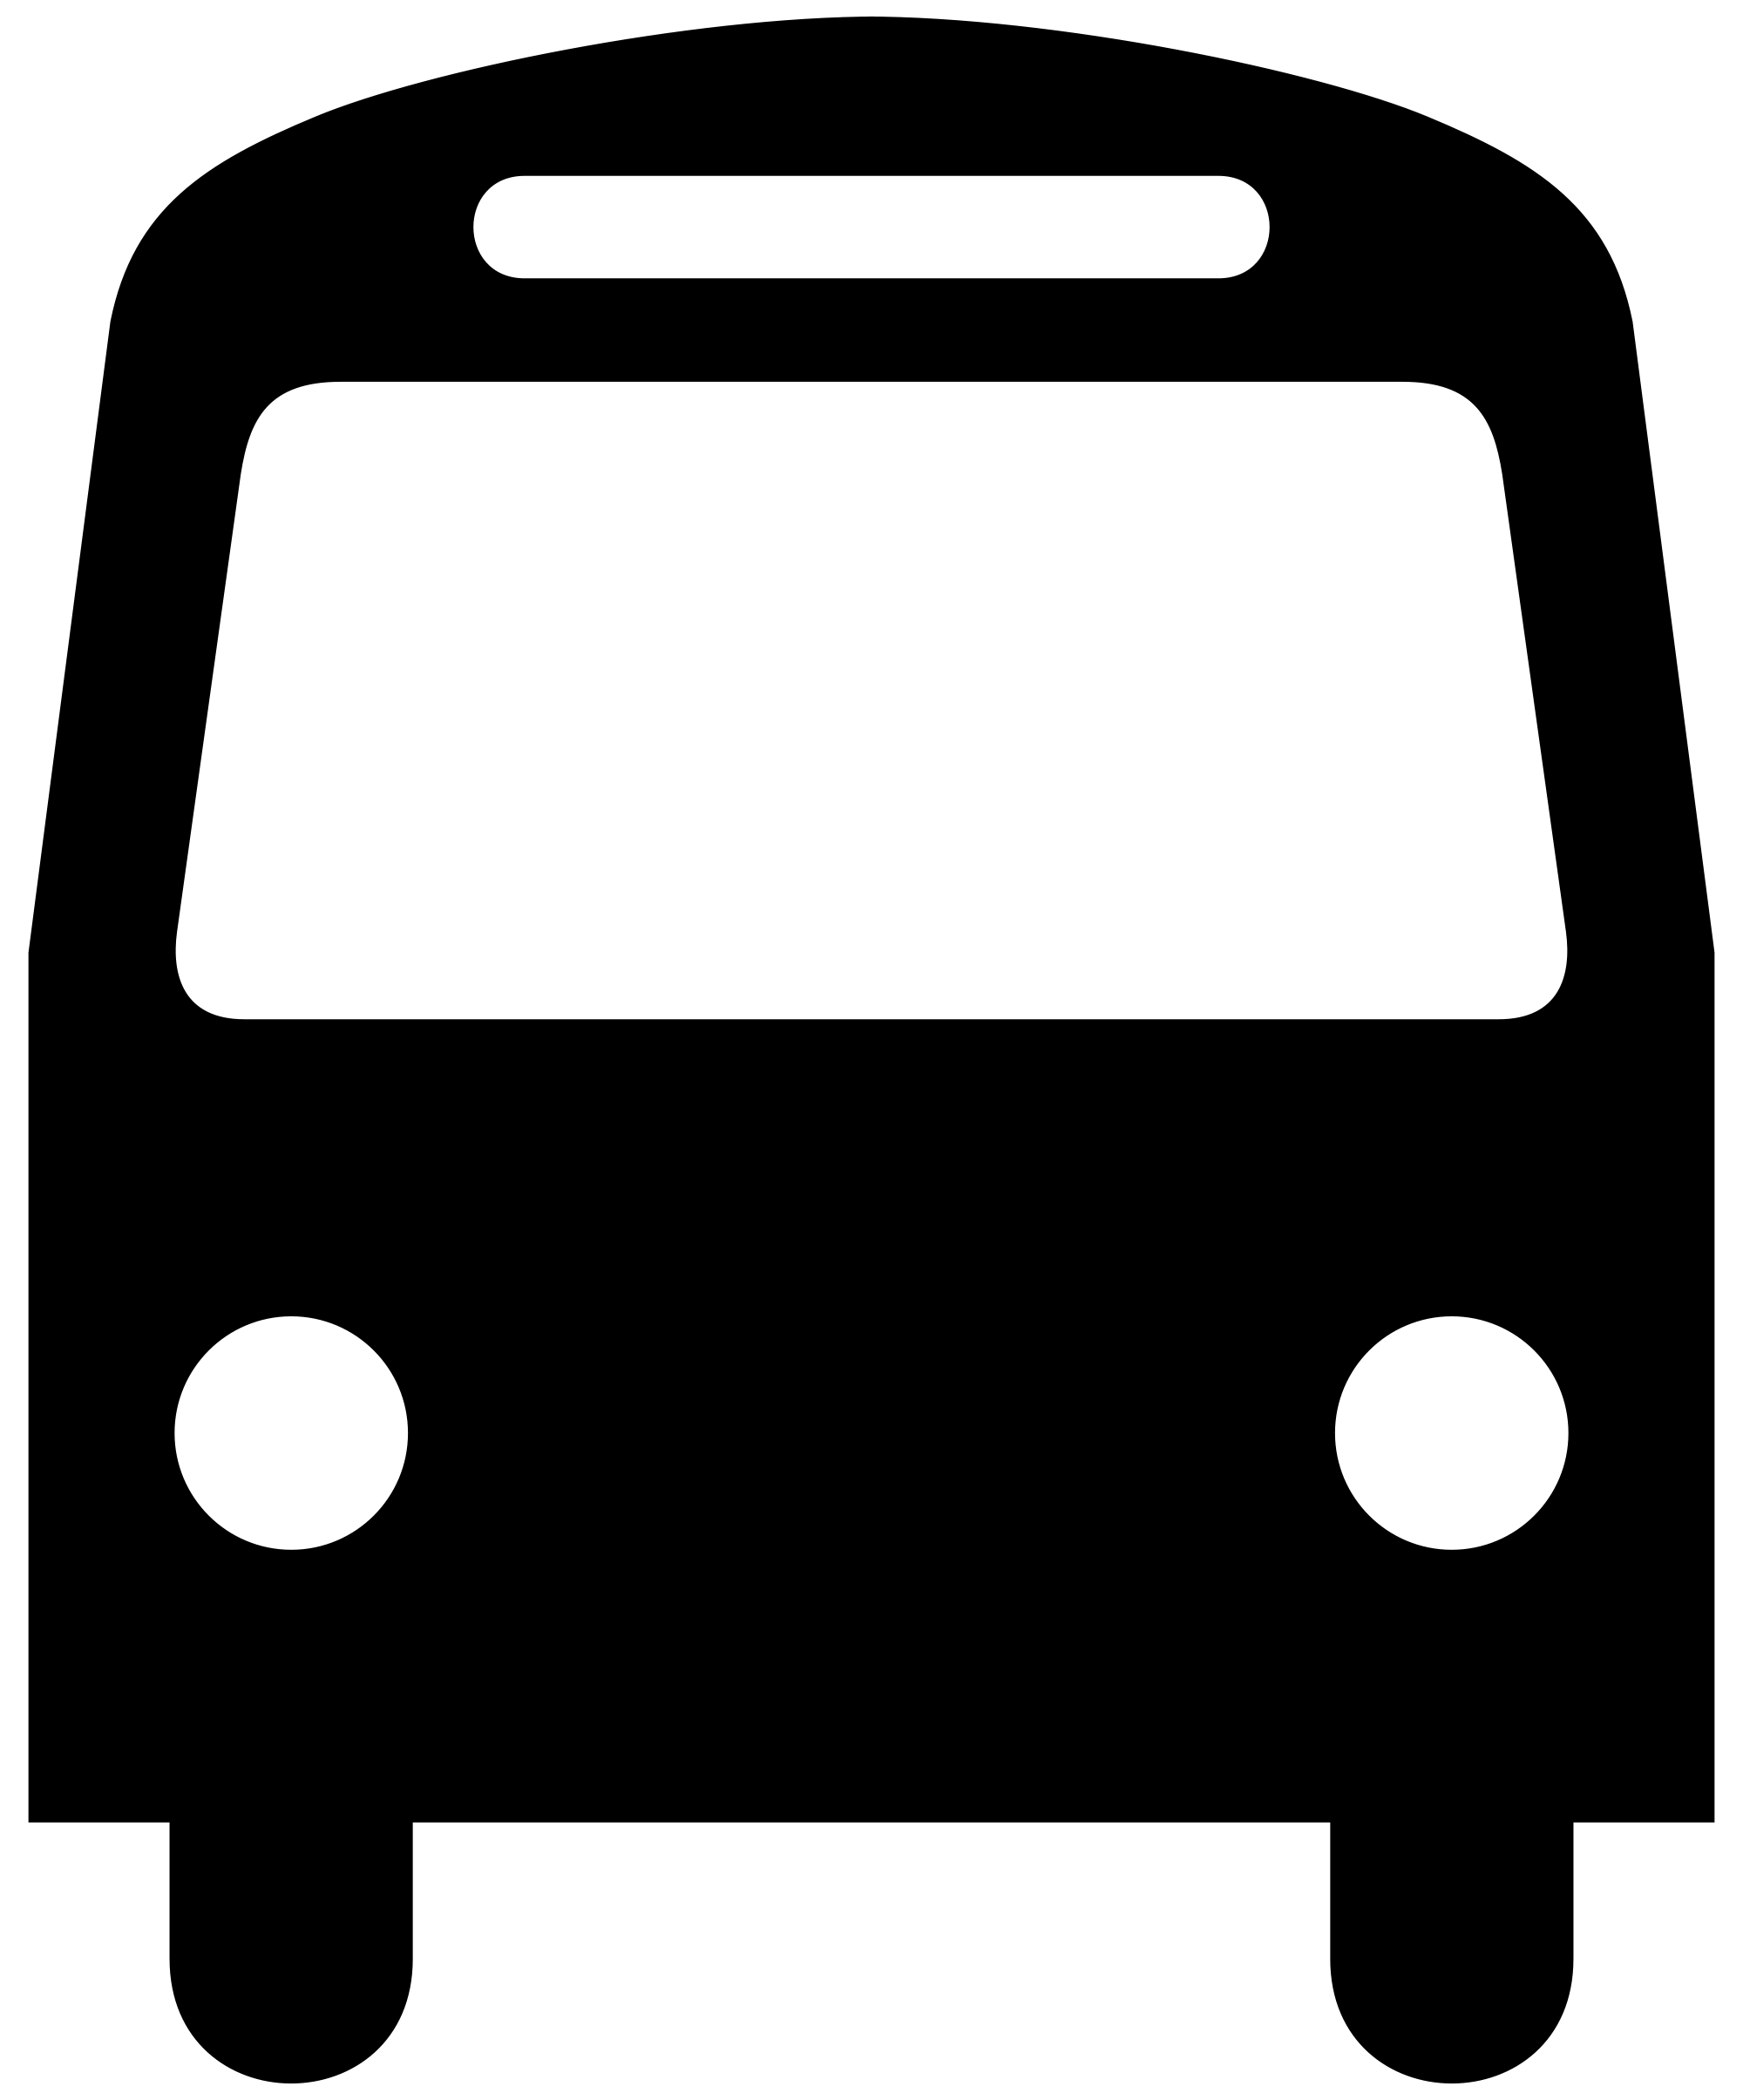 Bus shuttle bus